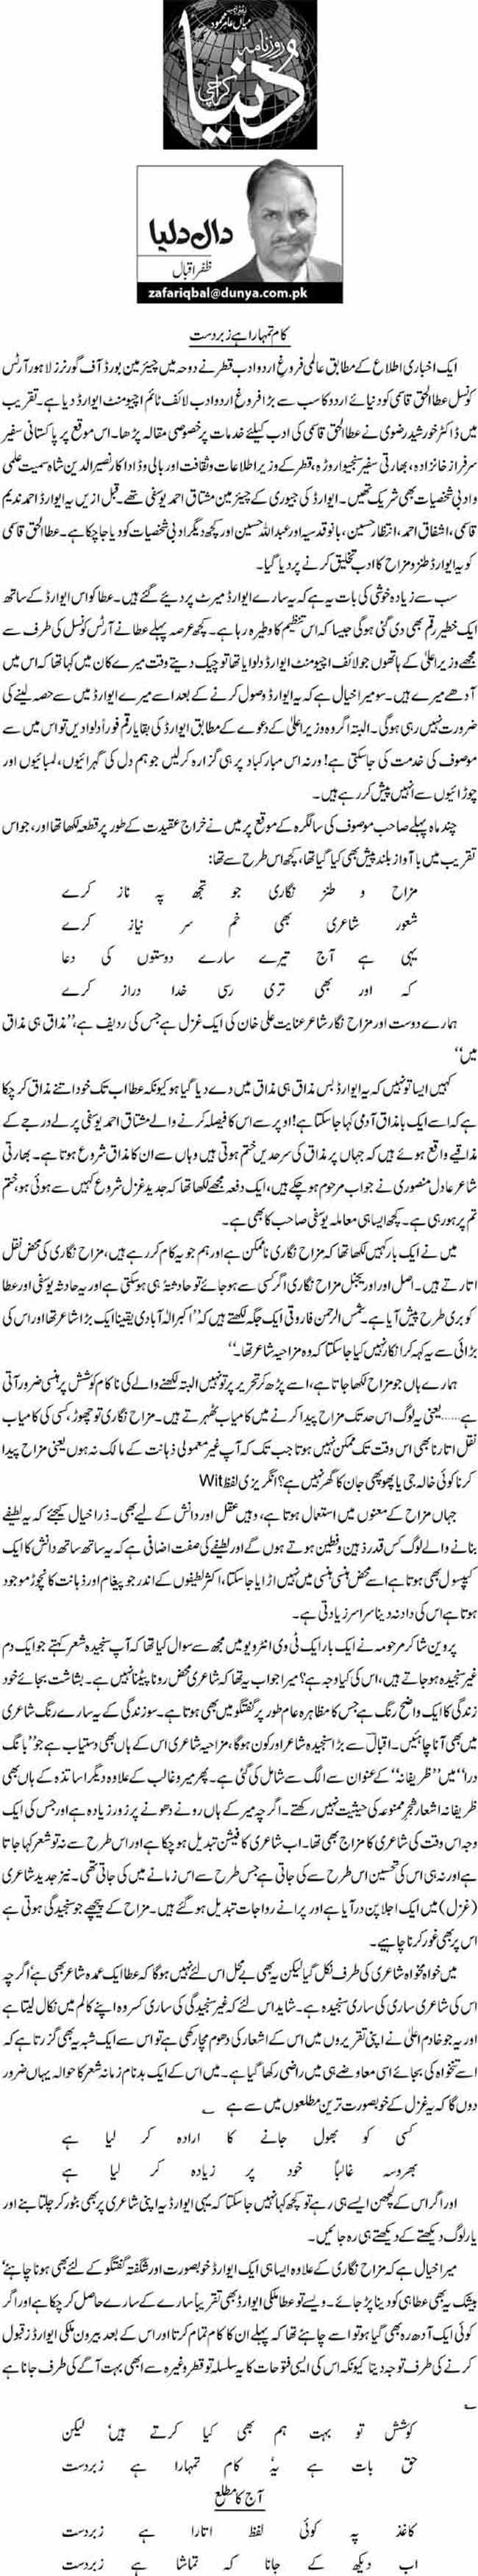 Kaam tumahara hai zabardast - Zafar Iqbal